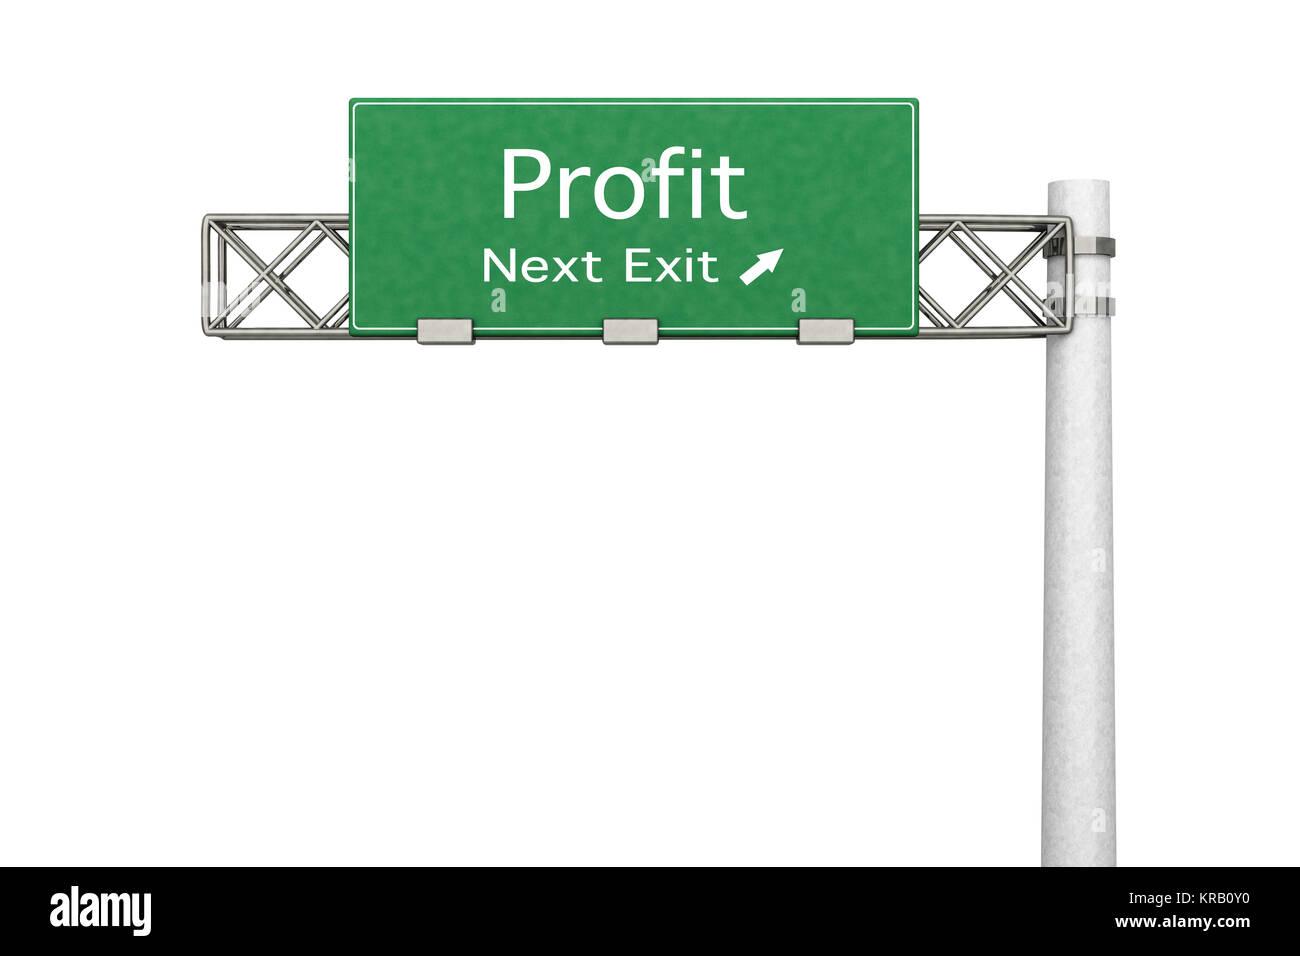 3D rendered Illustration. Highway Sign - Next exit to Profit making. - Stock Image